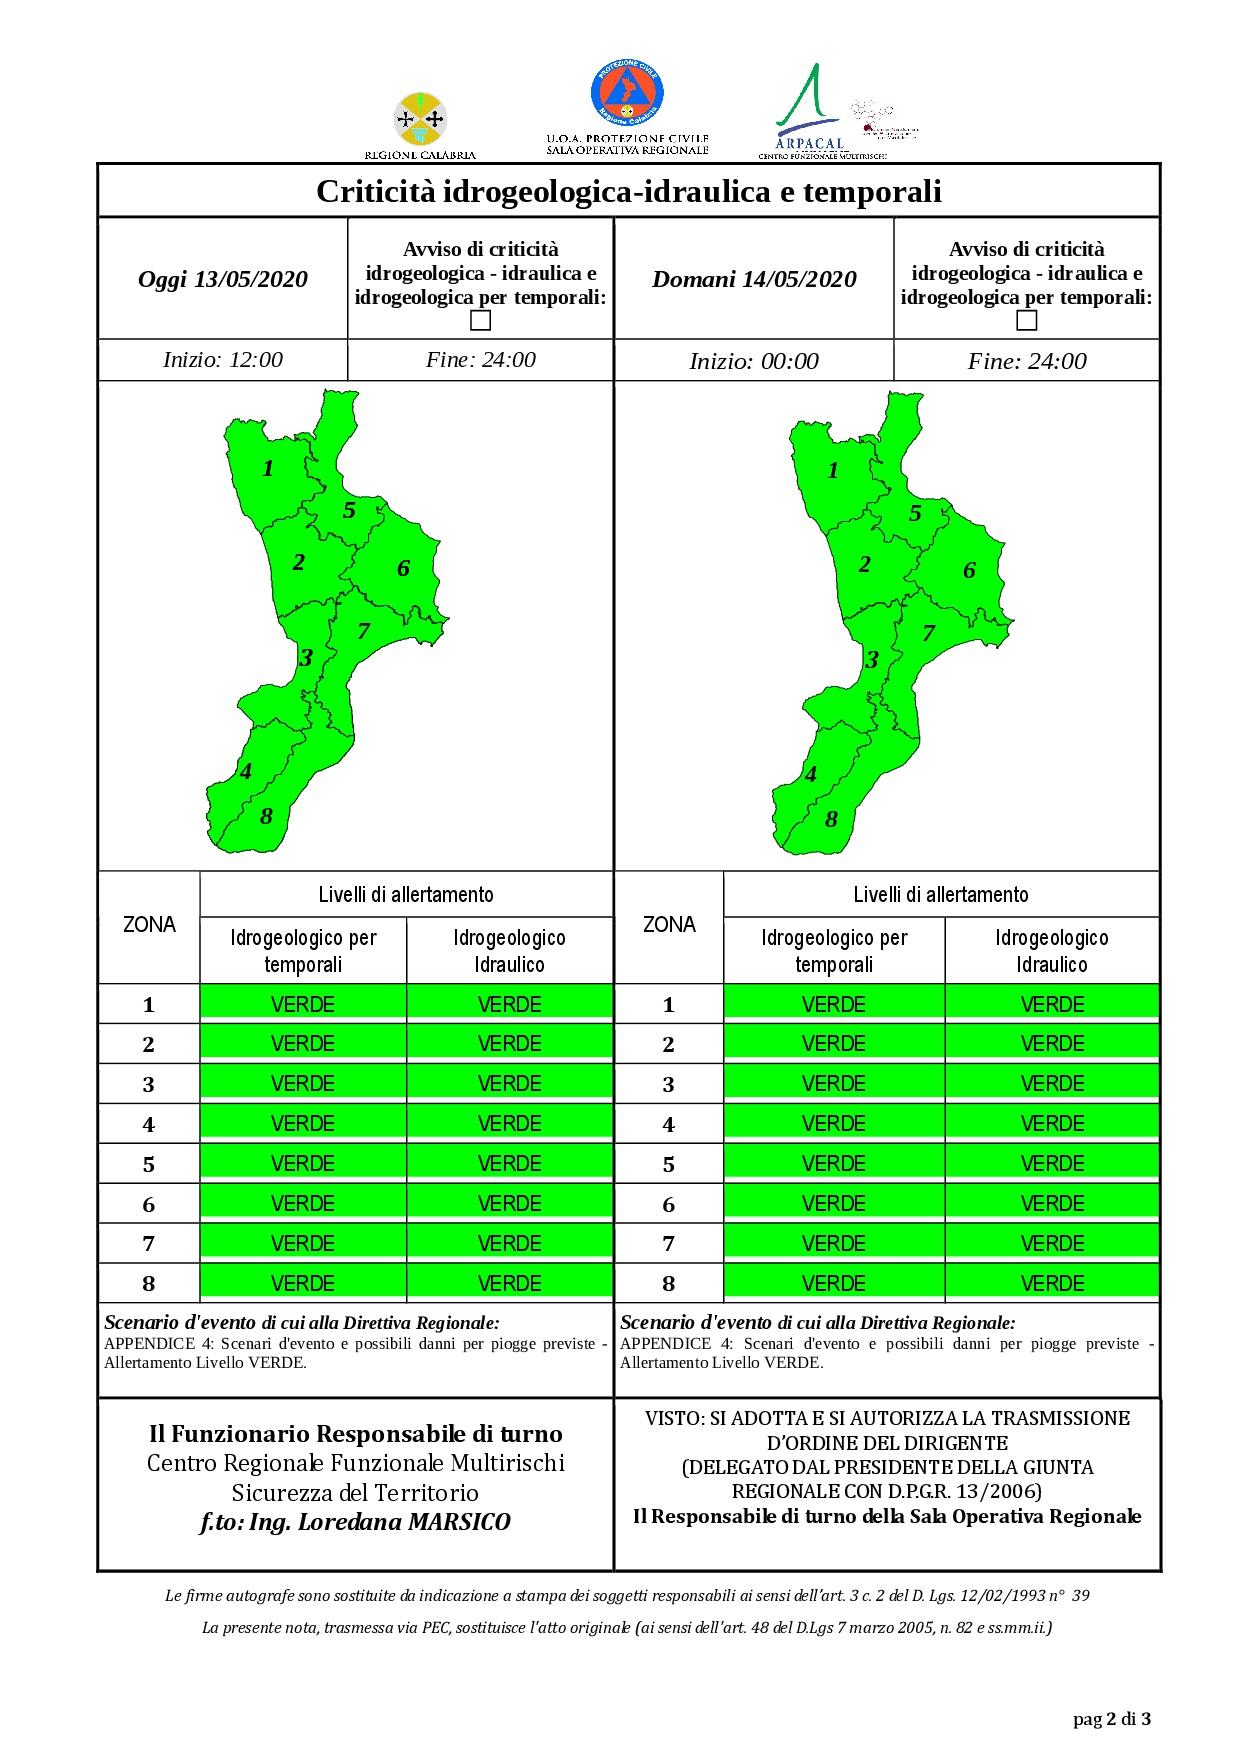 Criticità idrogeologica-idraulica e temporali in Calabria 13-05-2020